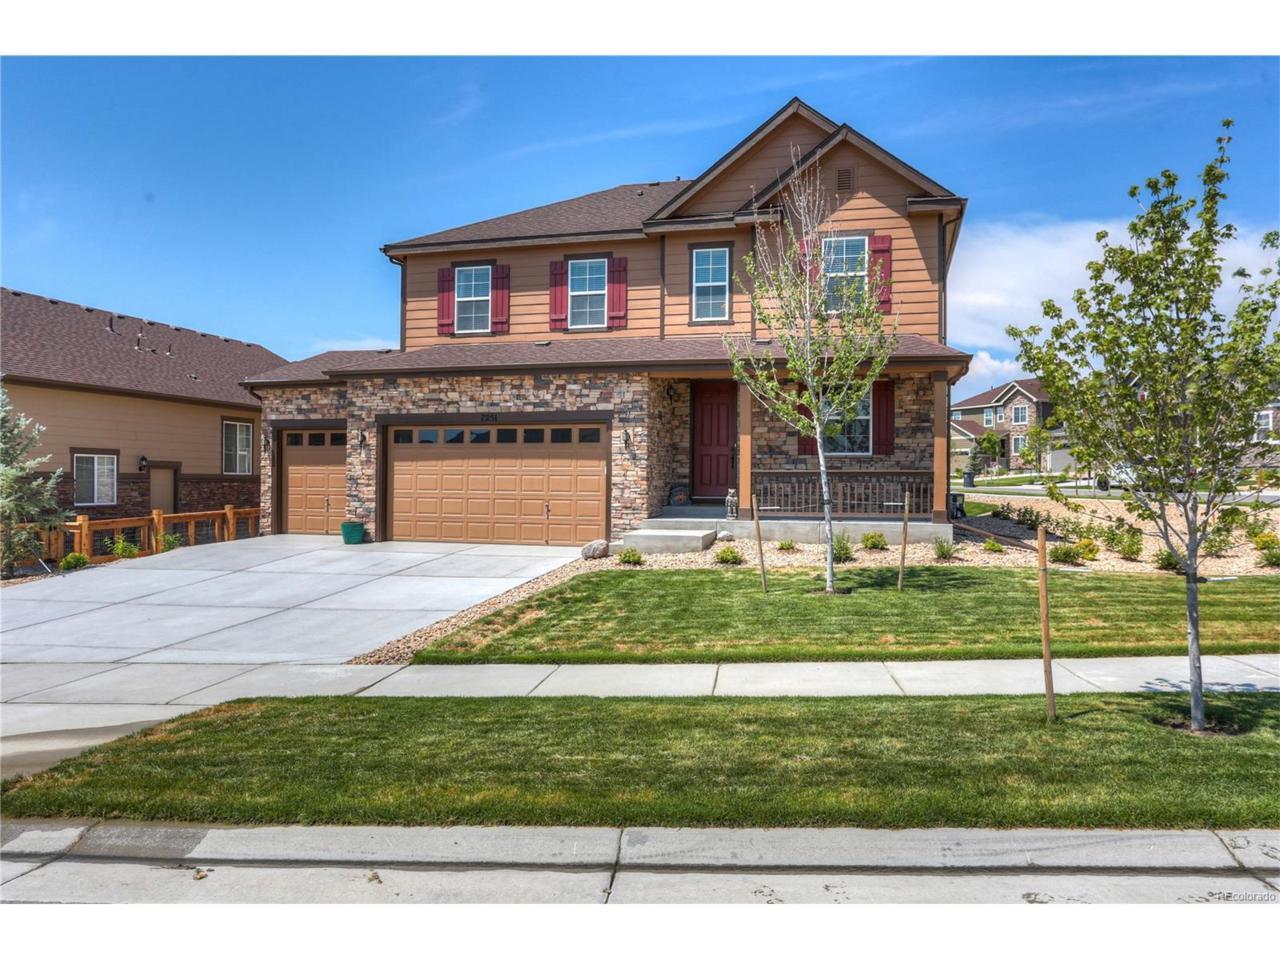 7251 S Old Hammer Way, Aurora, CO 80016 (MLS #5430005) :: 8z Real Estate